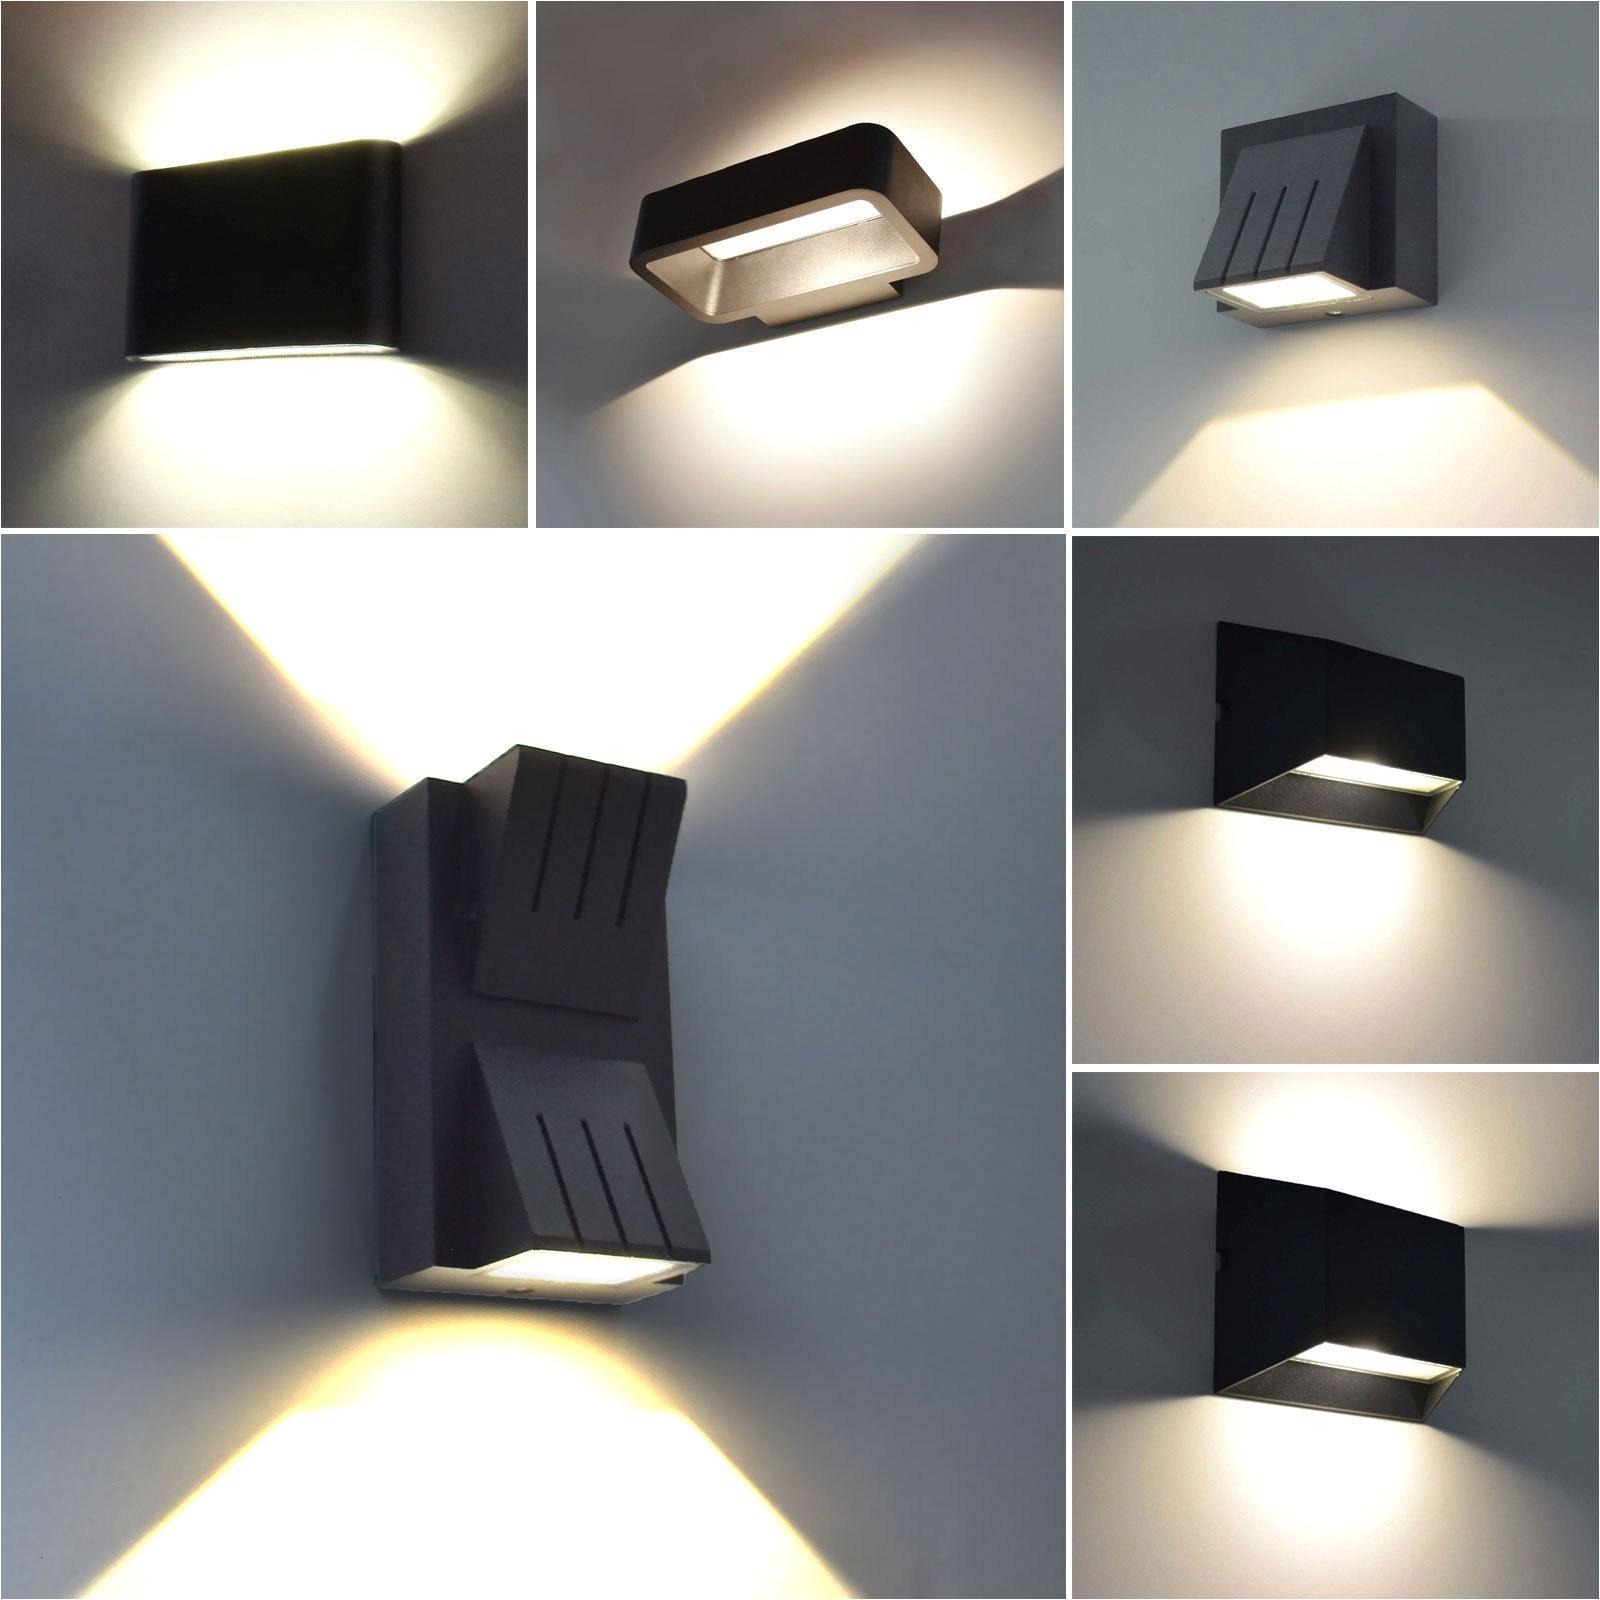 exterior soffit lighting fixtures 25 new outdoor recessed wall lights douglaschannelenergy